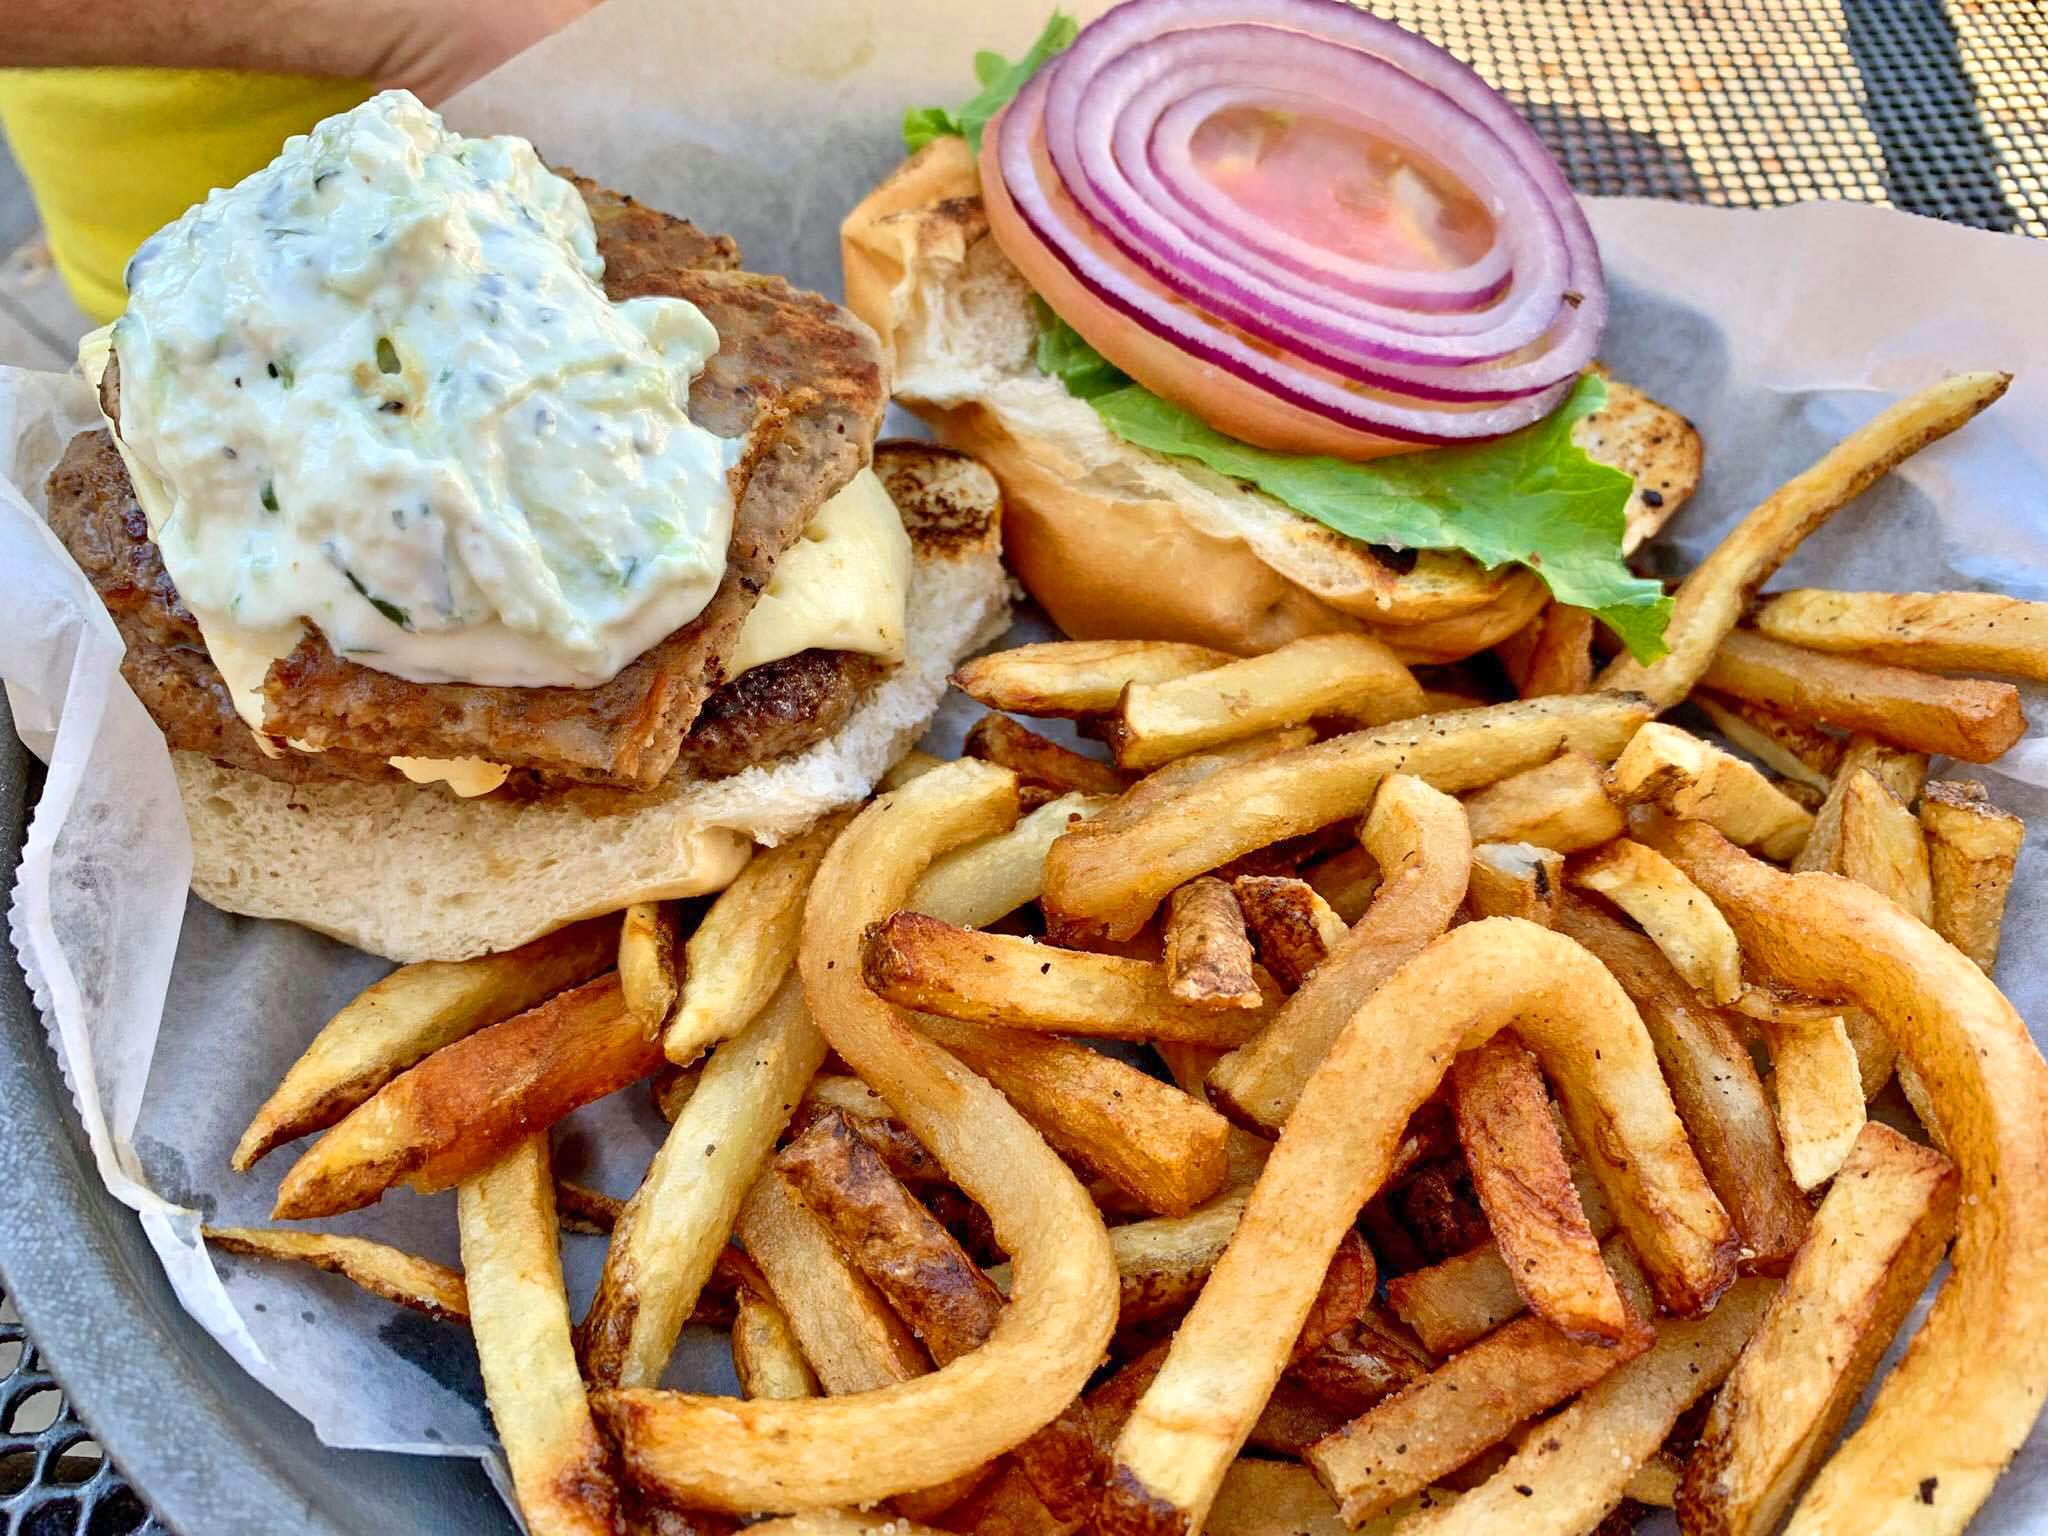 The Burg Gyro Burger